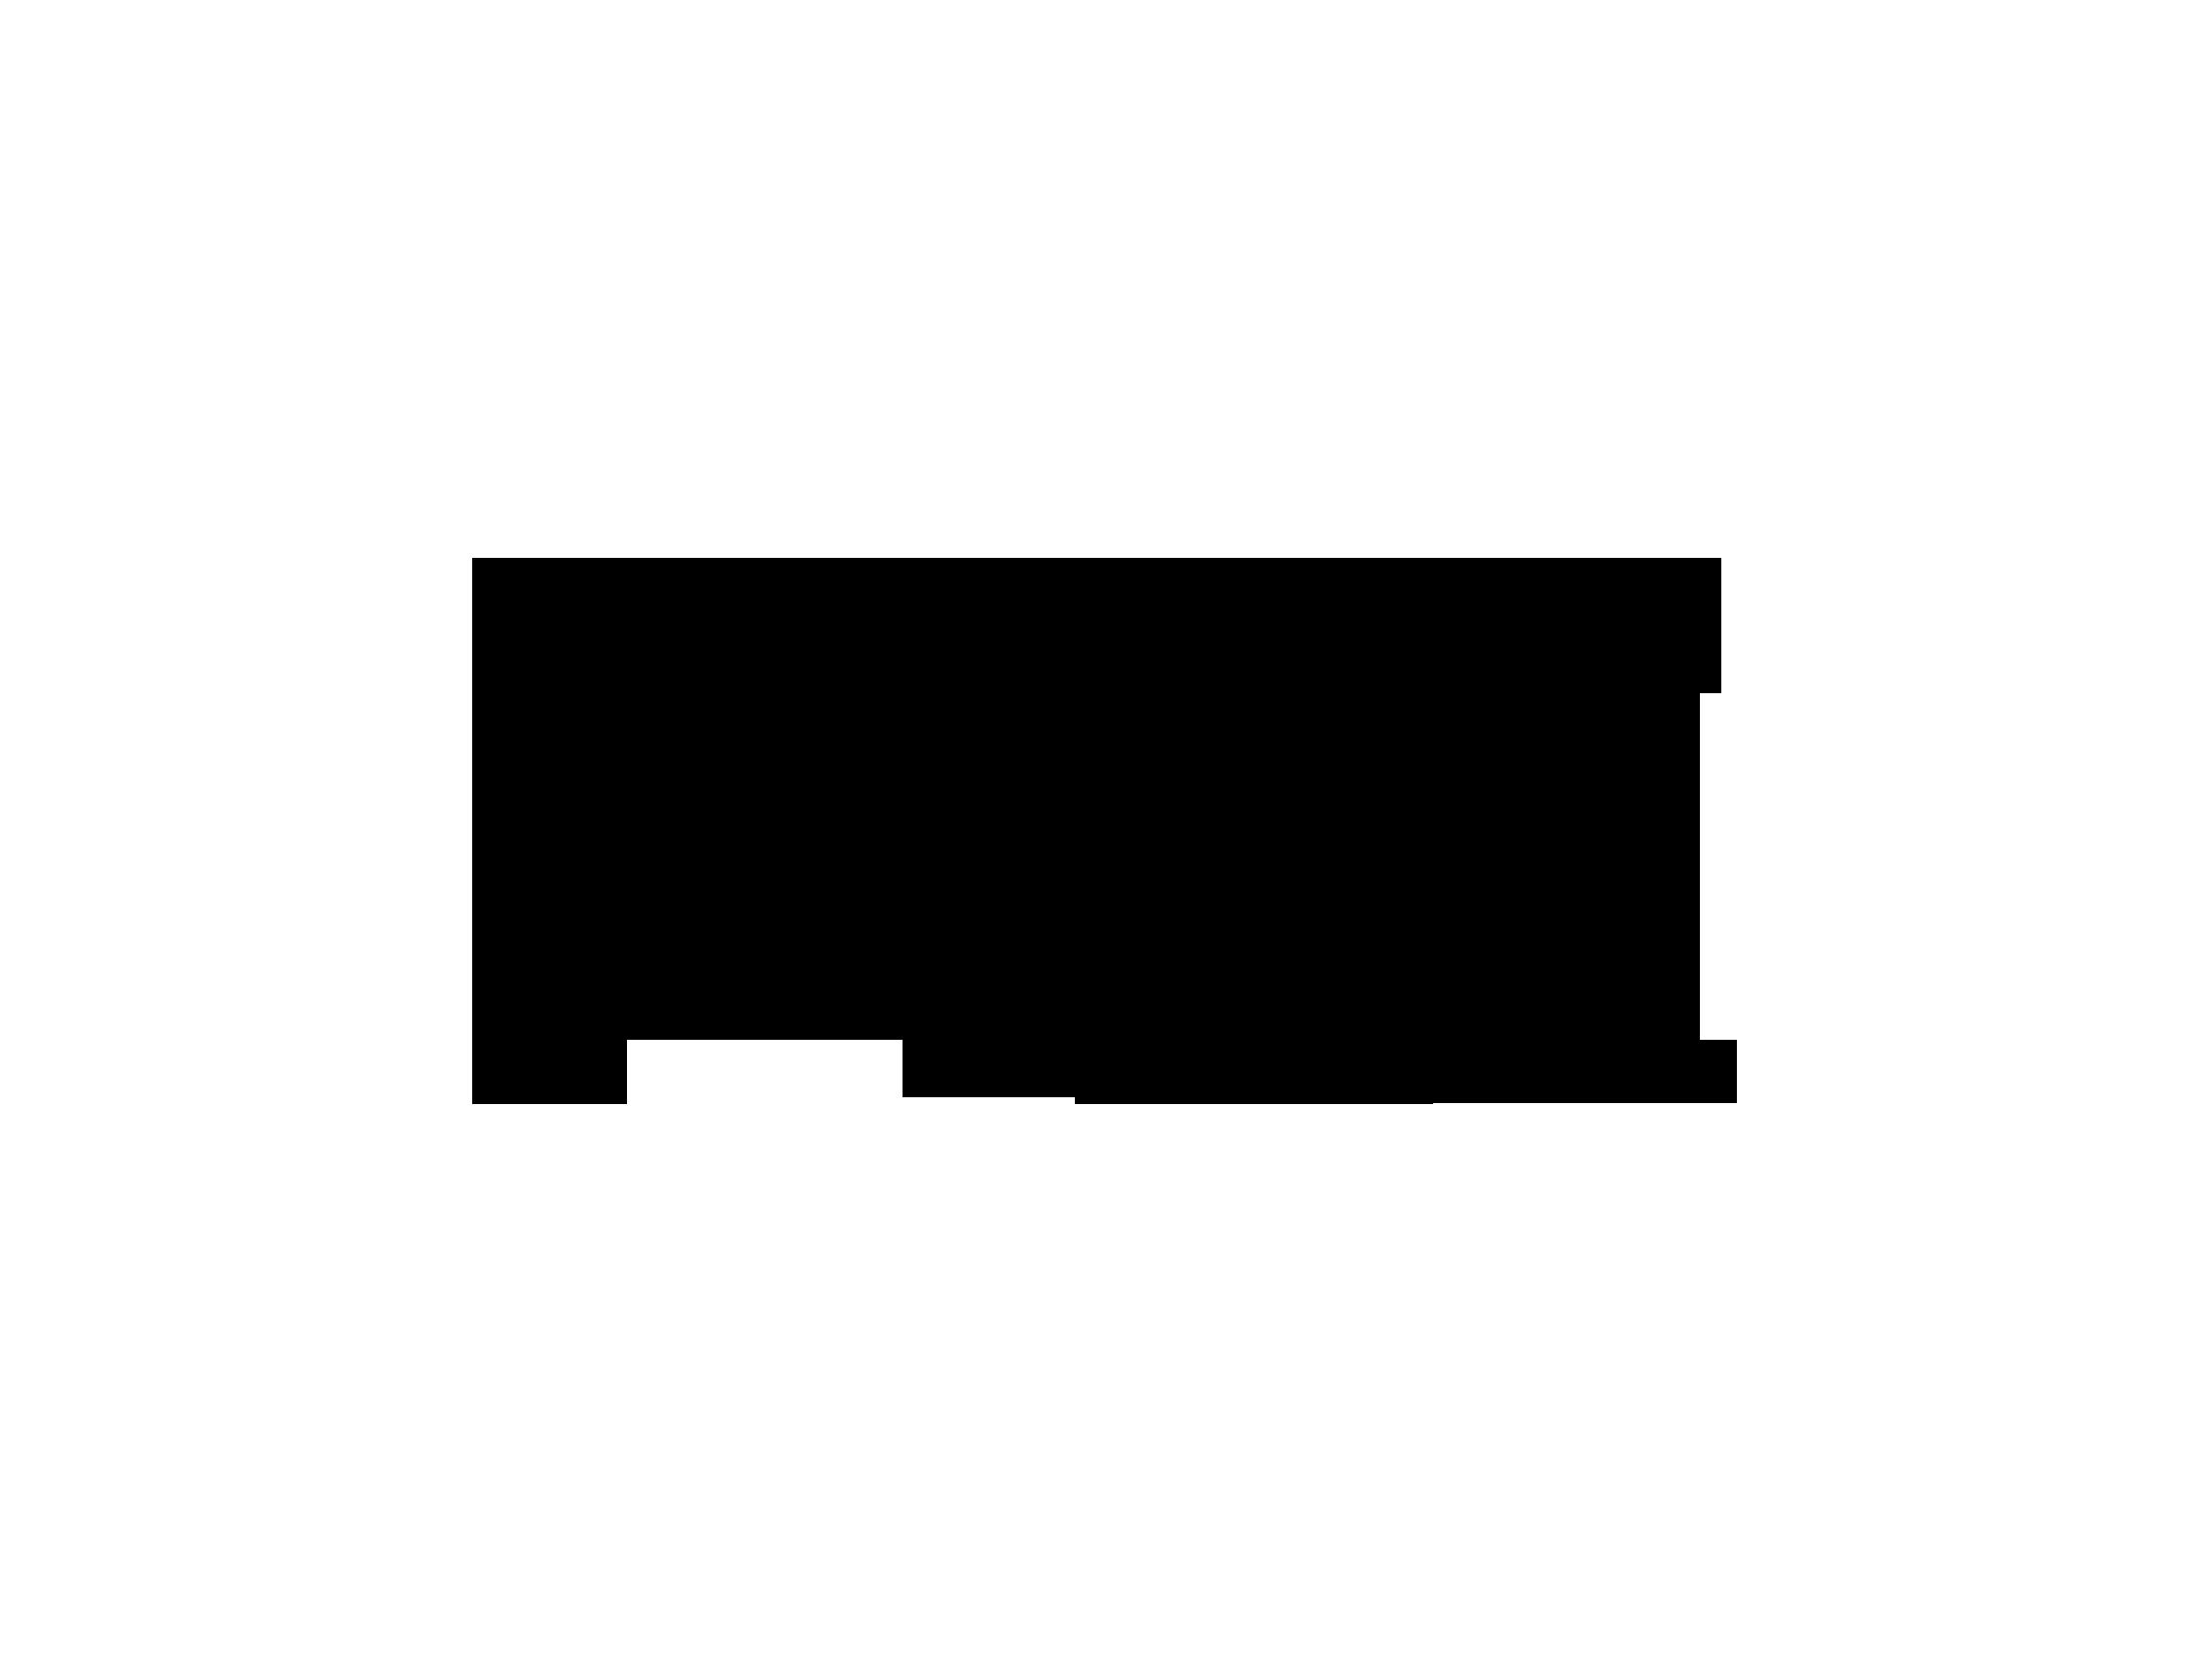 https://maddivaconcierge.com/wp-content/uploads/2017/05/FOX-TV-logo.png